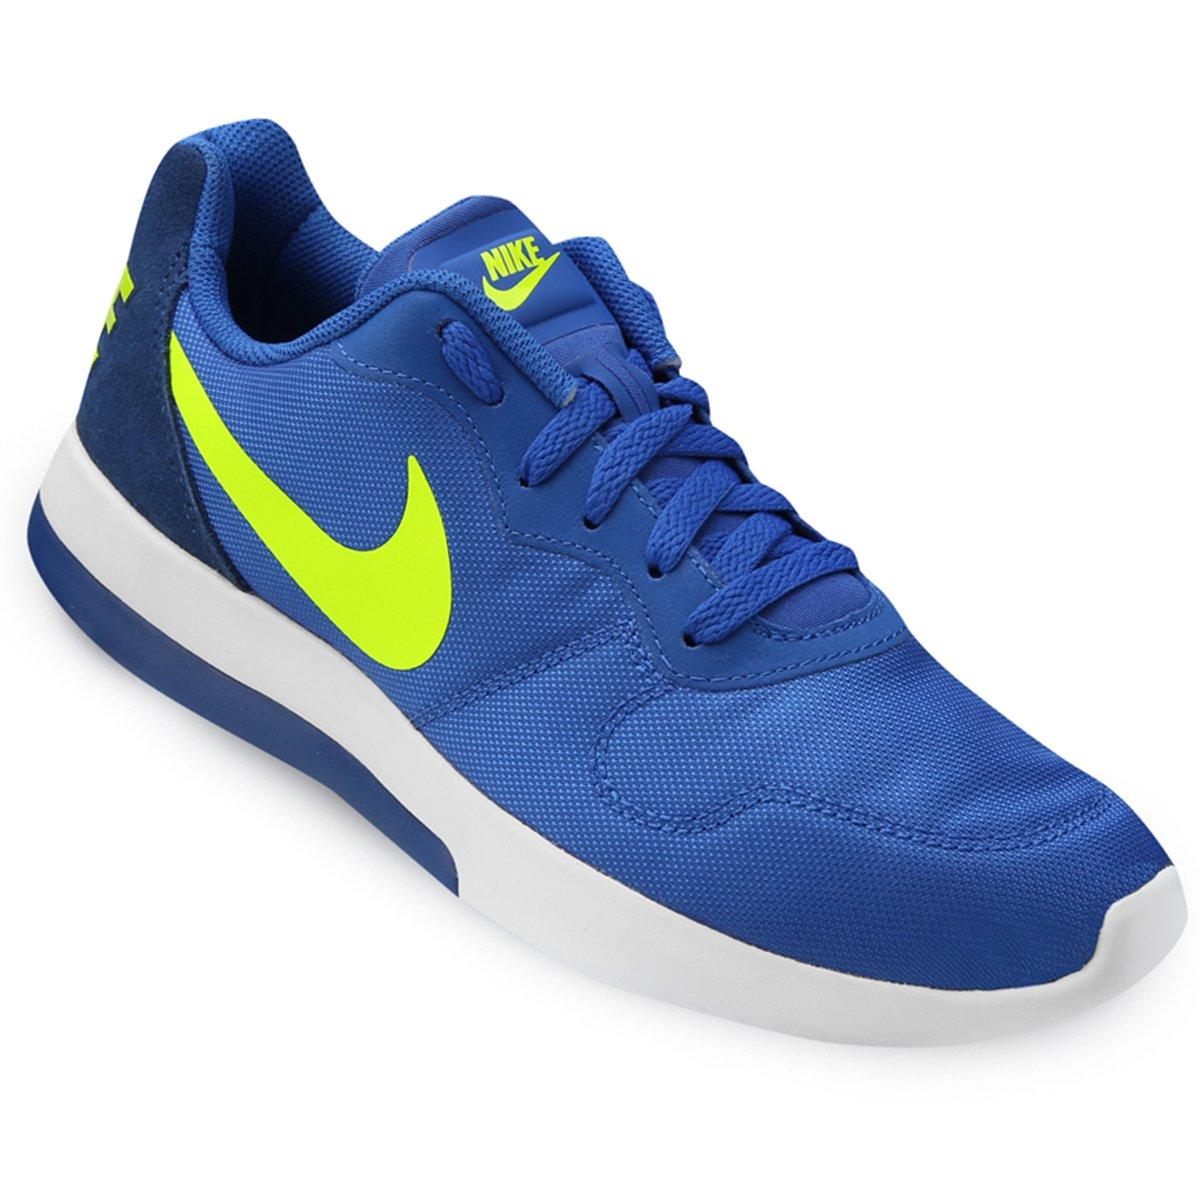 brand new f01b7 a1203 Tênis Nike Md Runner 2 Lw Masculino - Compre Agora  Netshoes